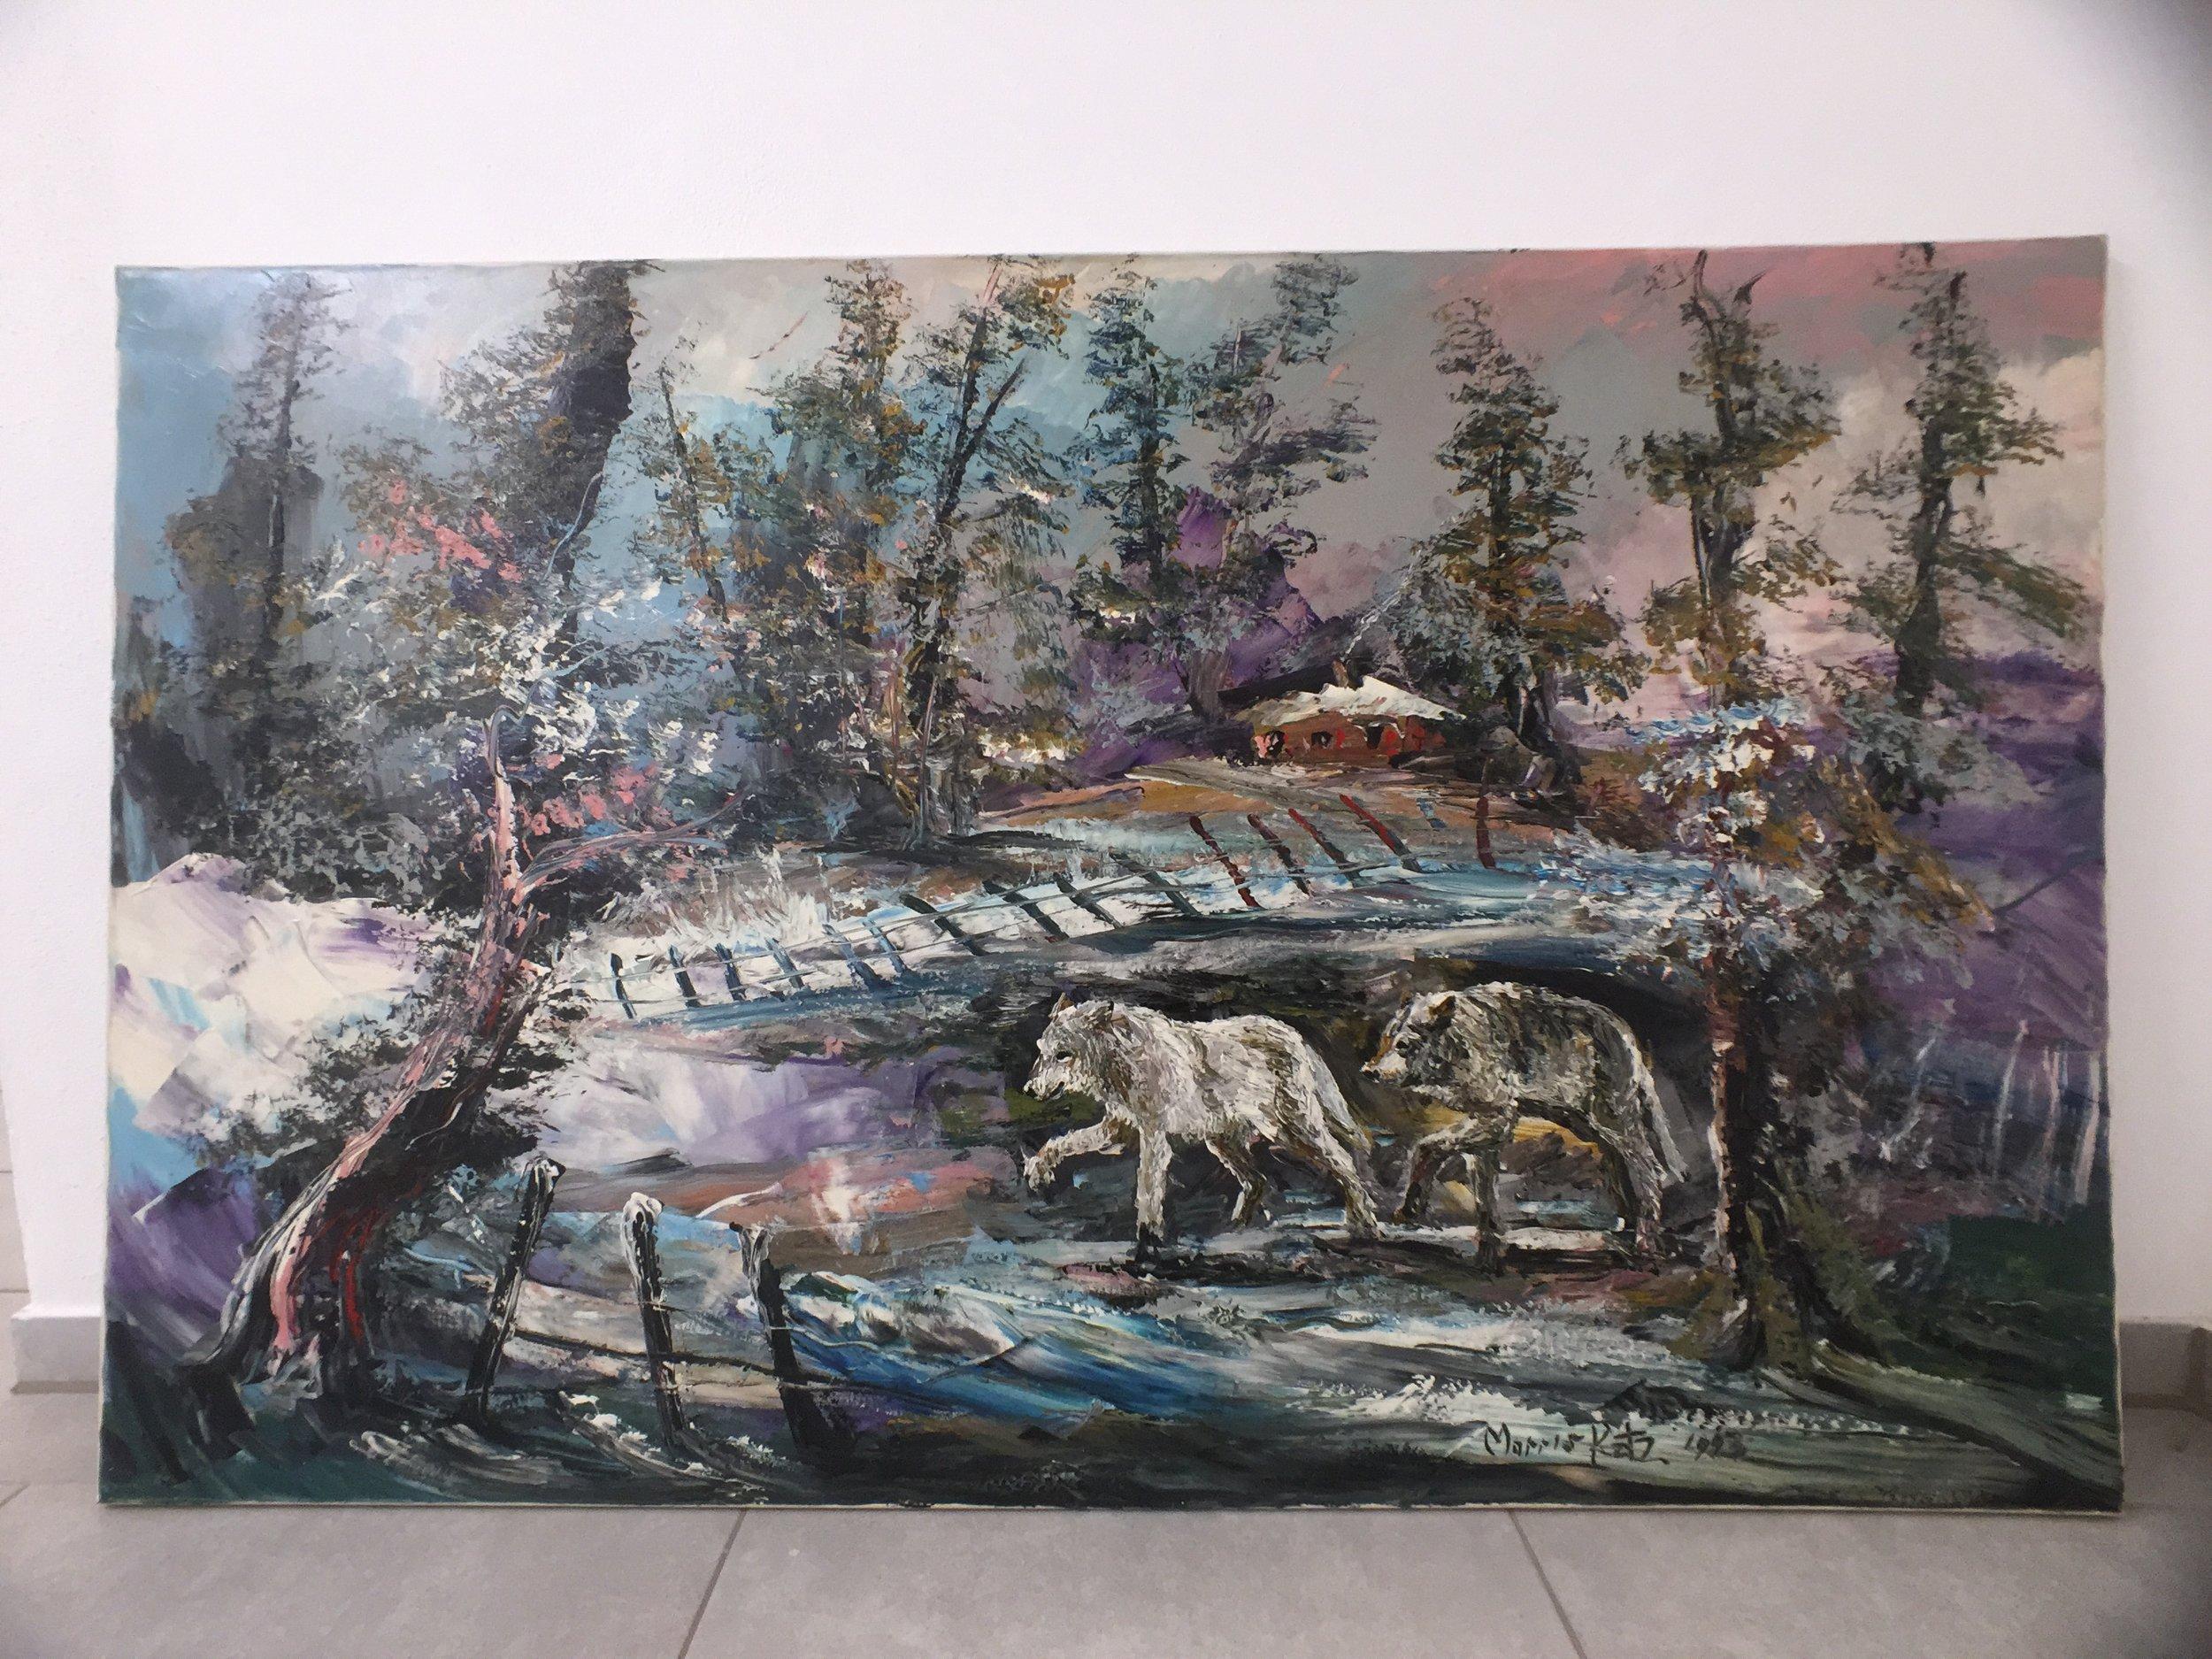 Morris Katz Painting gemälde 4.JPG